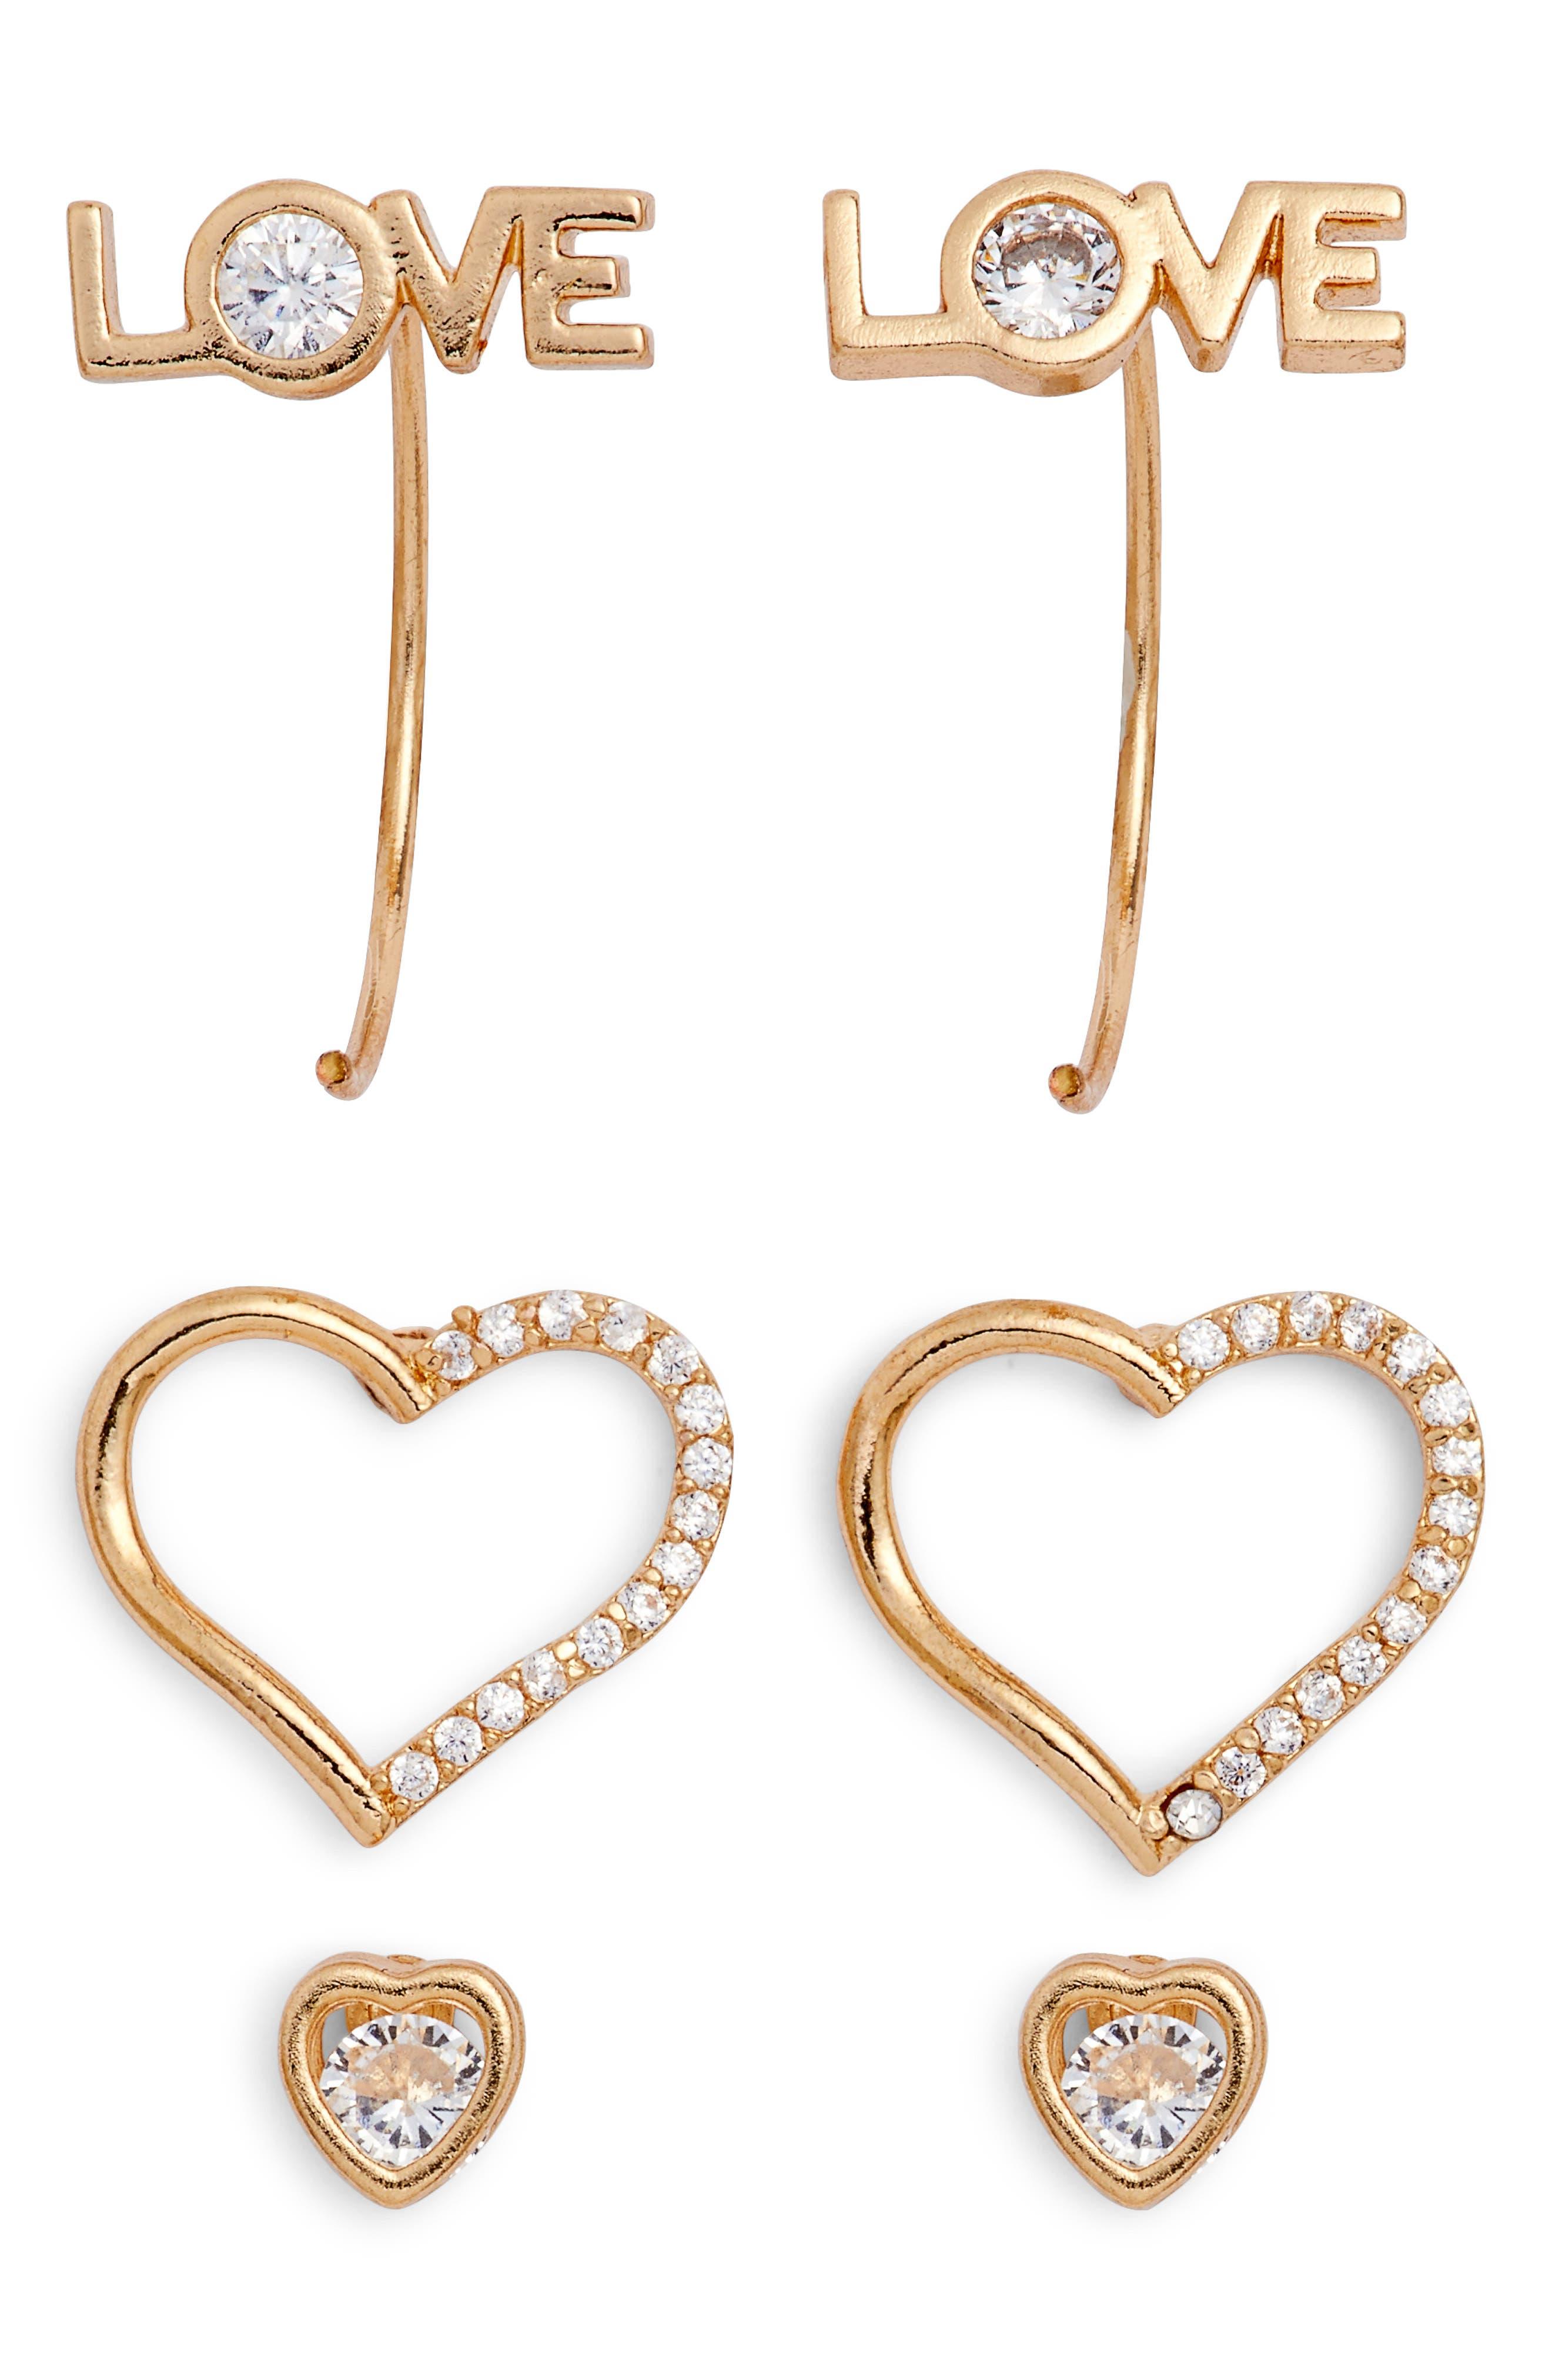 Loren Olivia Love 3-Pack Assorted Earrings